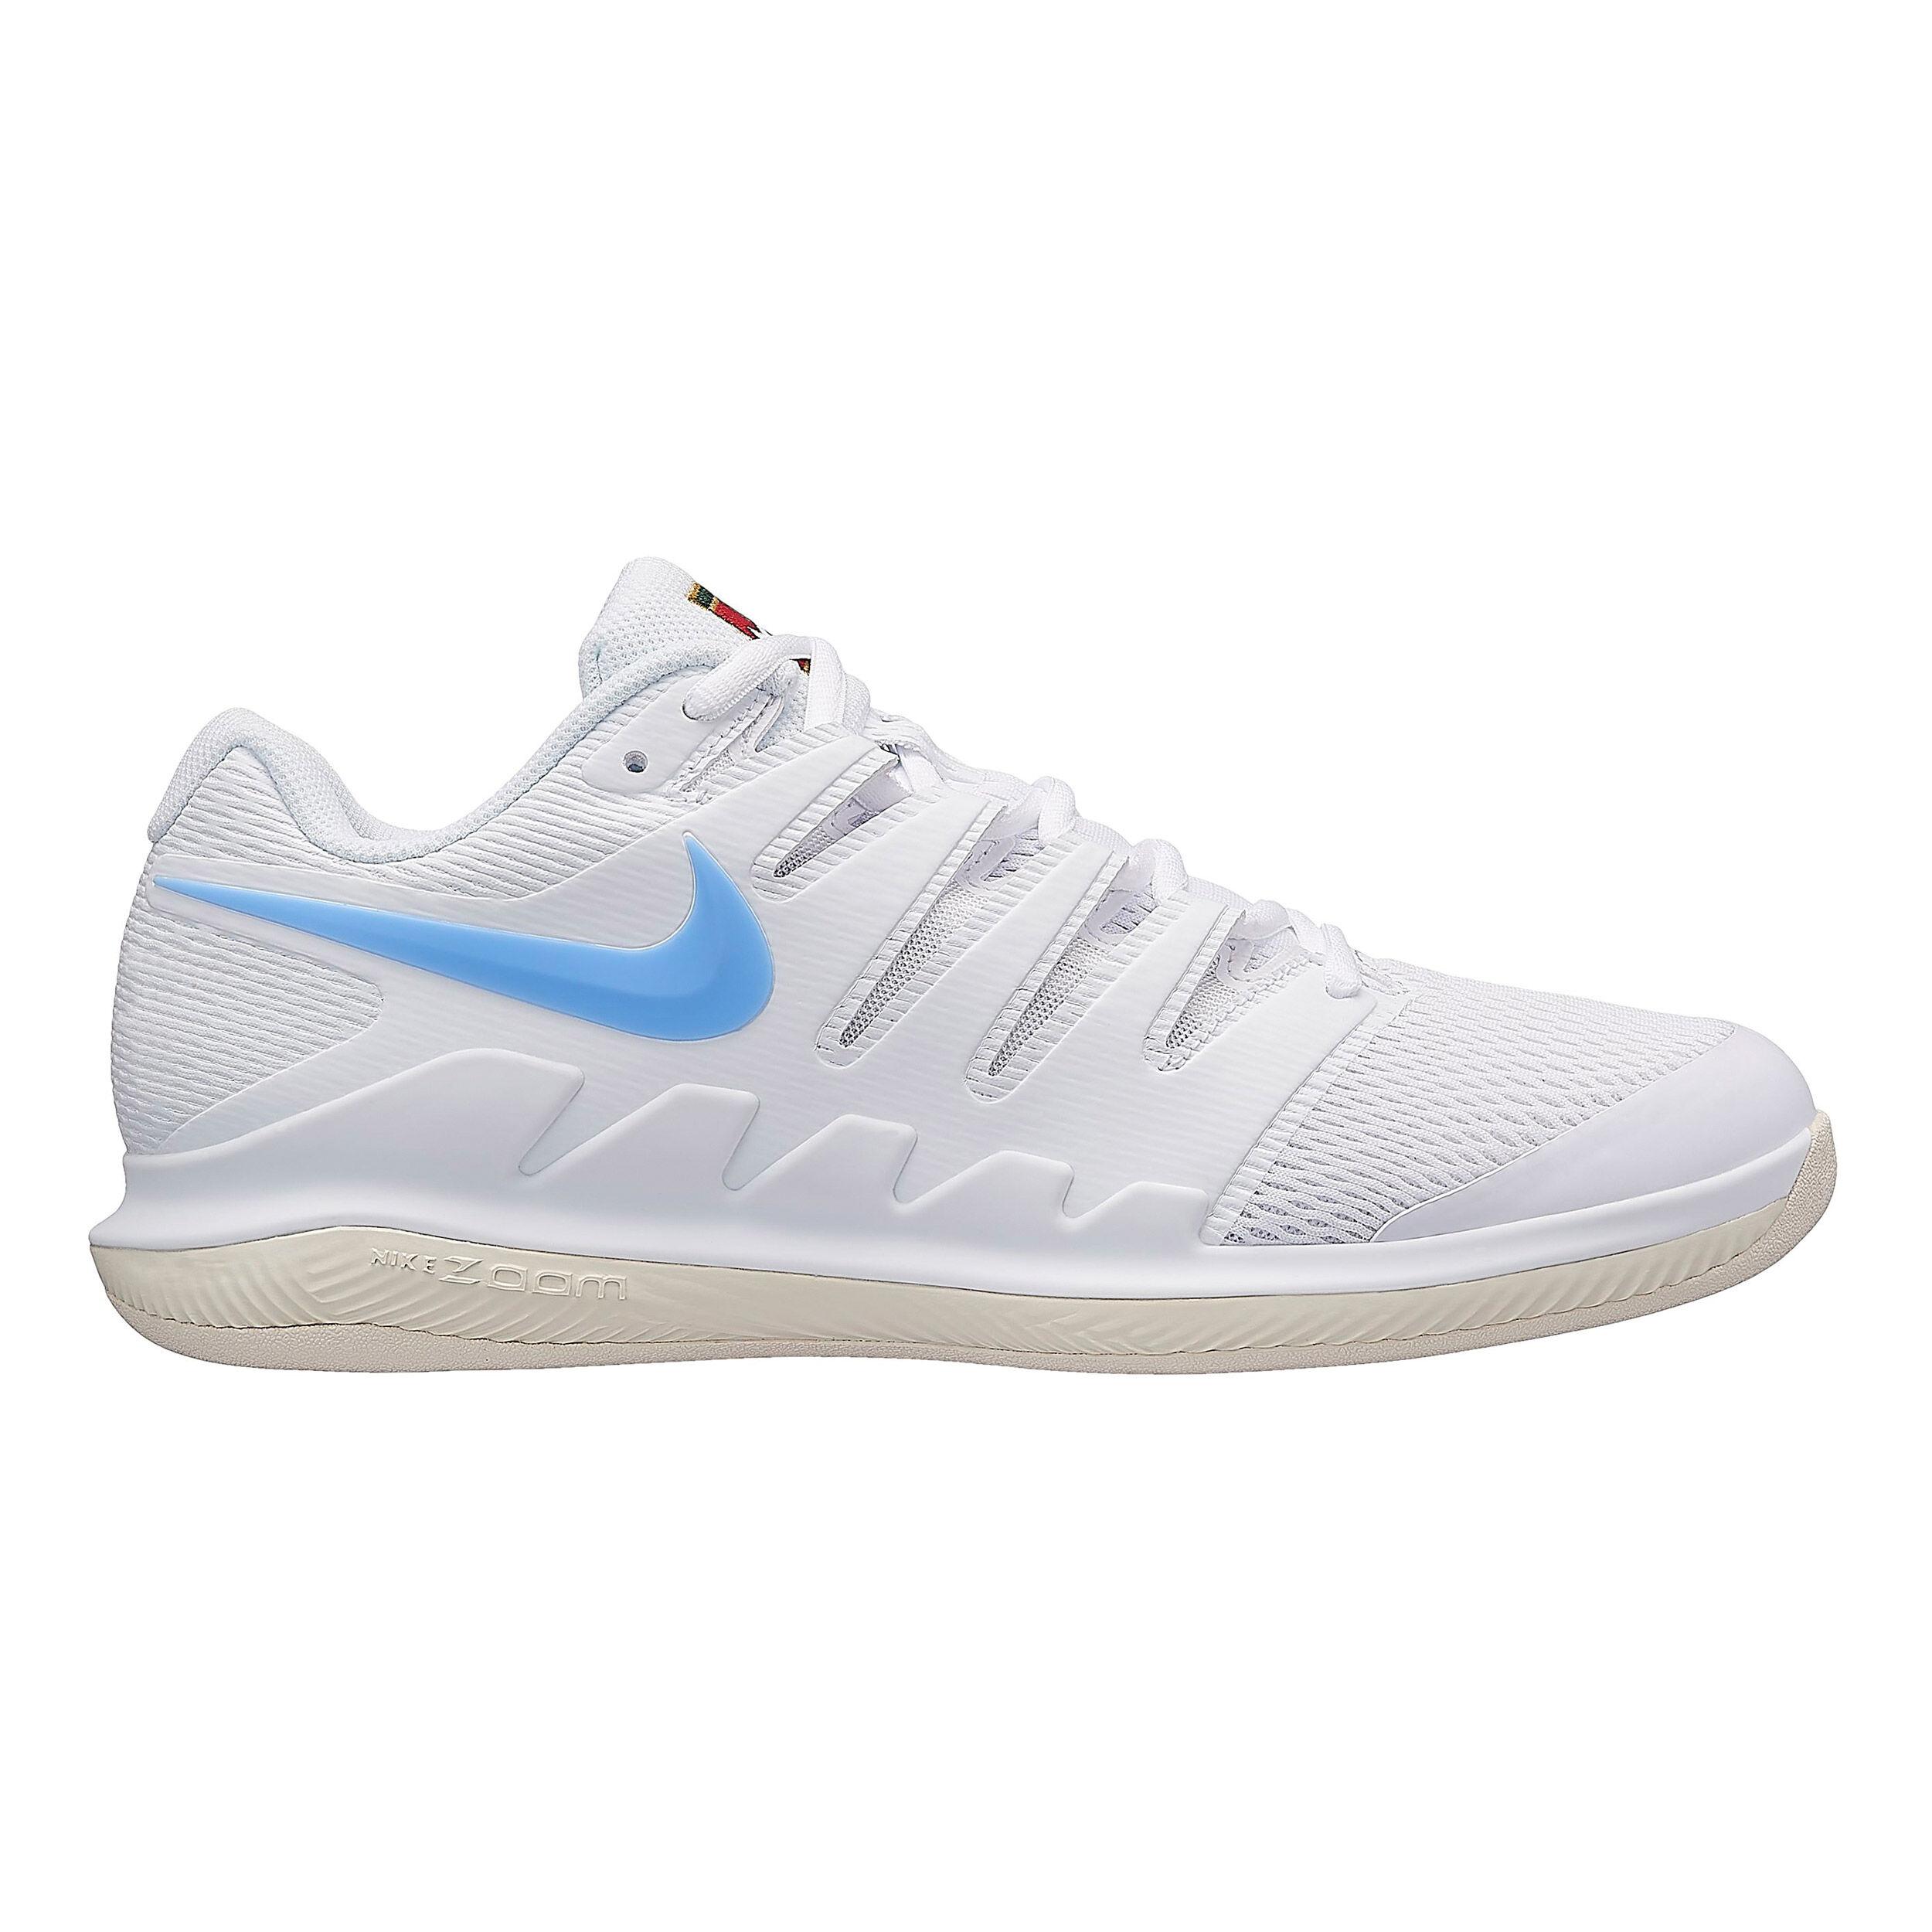 Nike Air Zoom Vapor X Chaussure Moquette Hommes Blanc , Crème